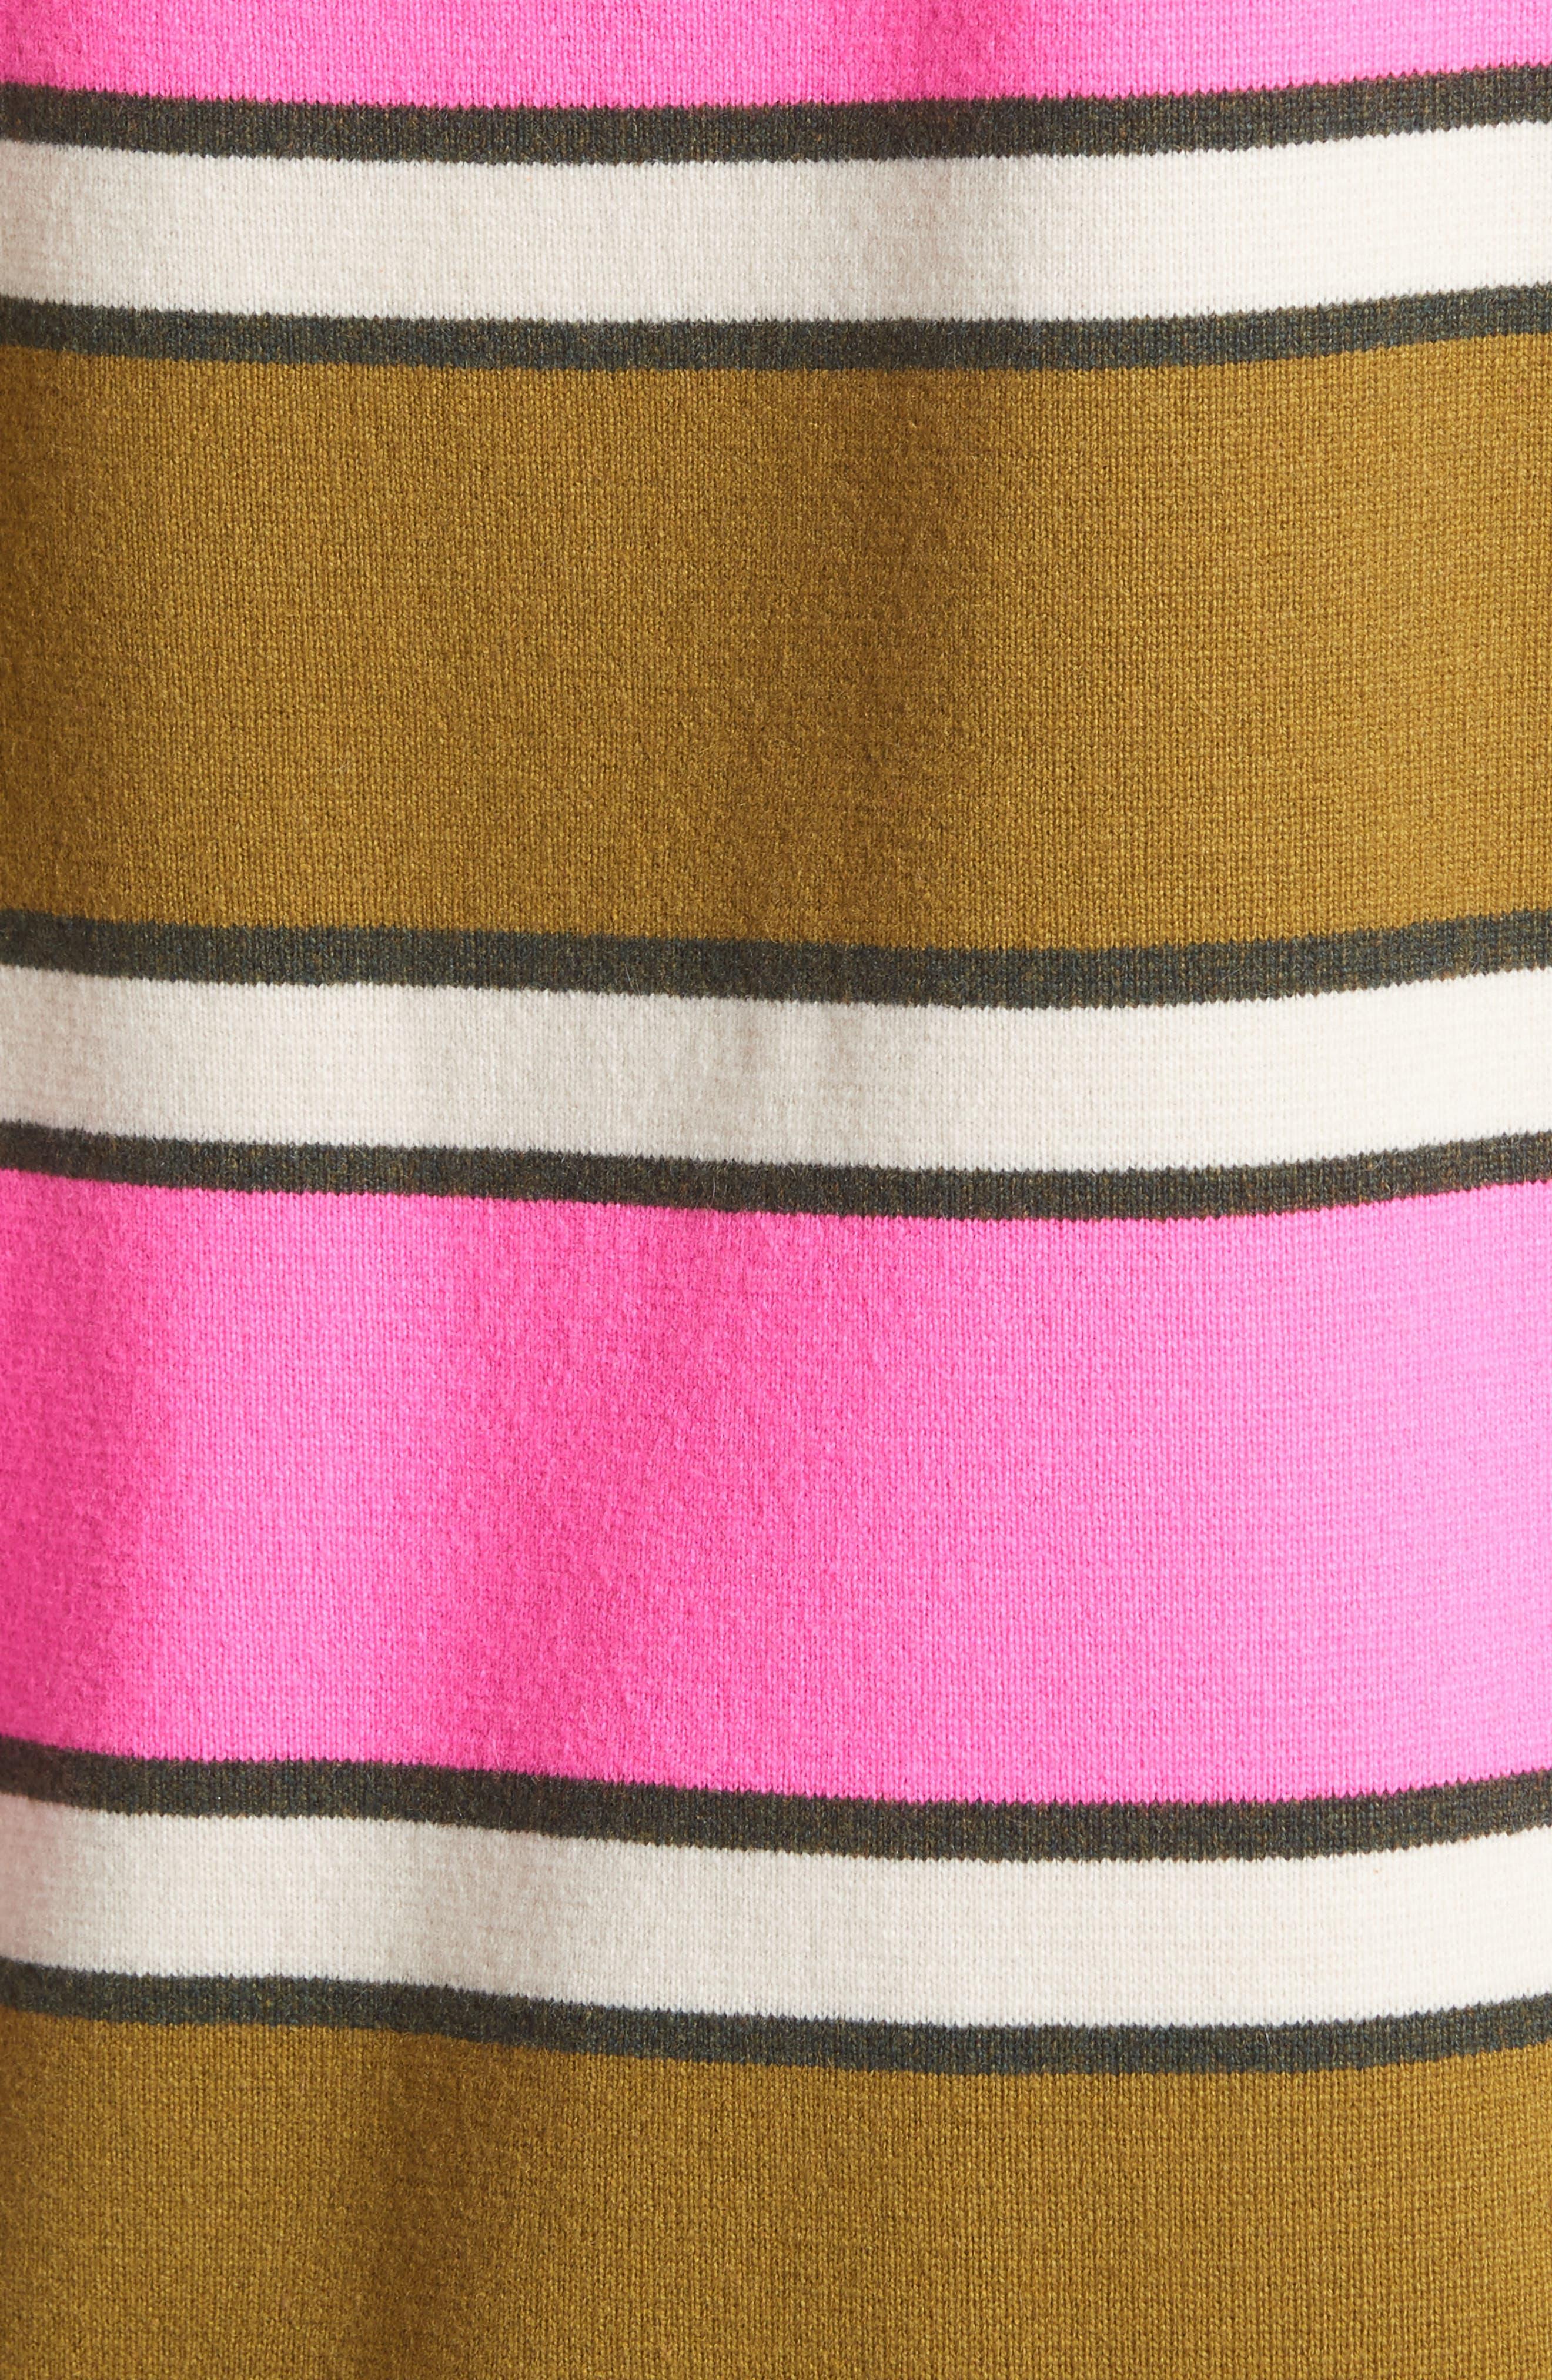 Oversize Stripe Cashmere Sweater,                             Alternate thumbnail 5, color,                             651